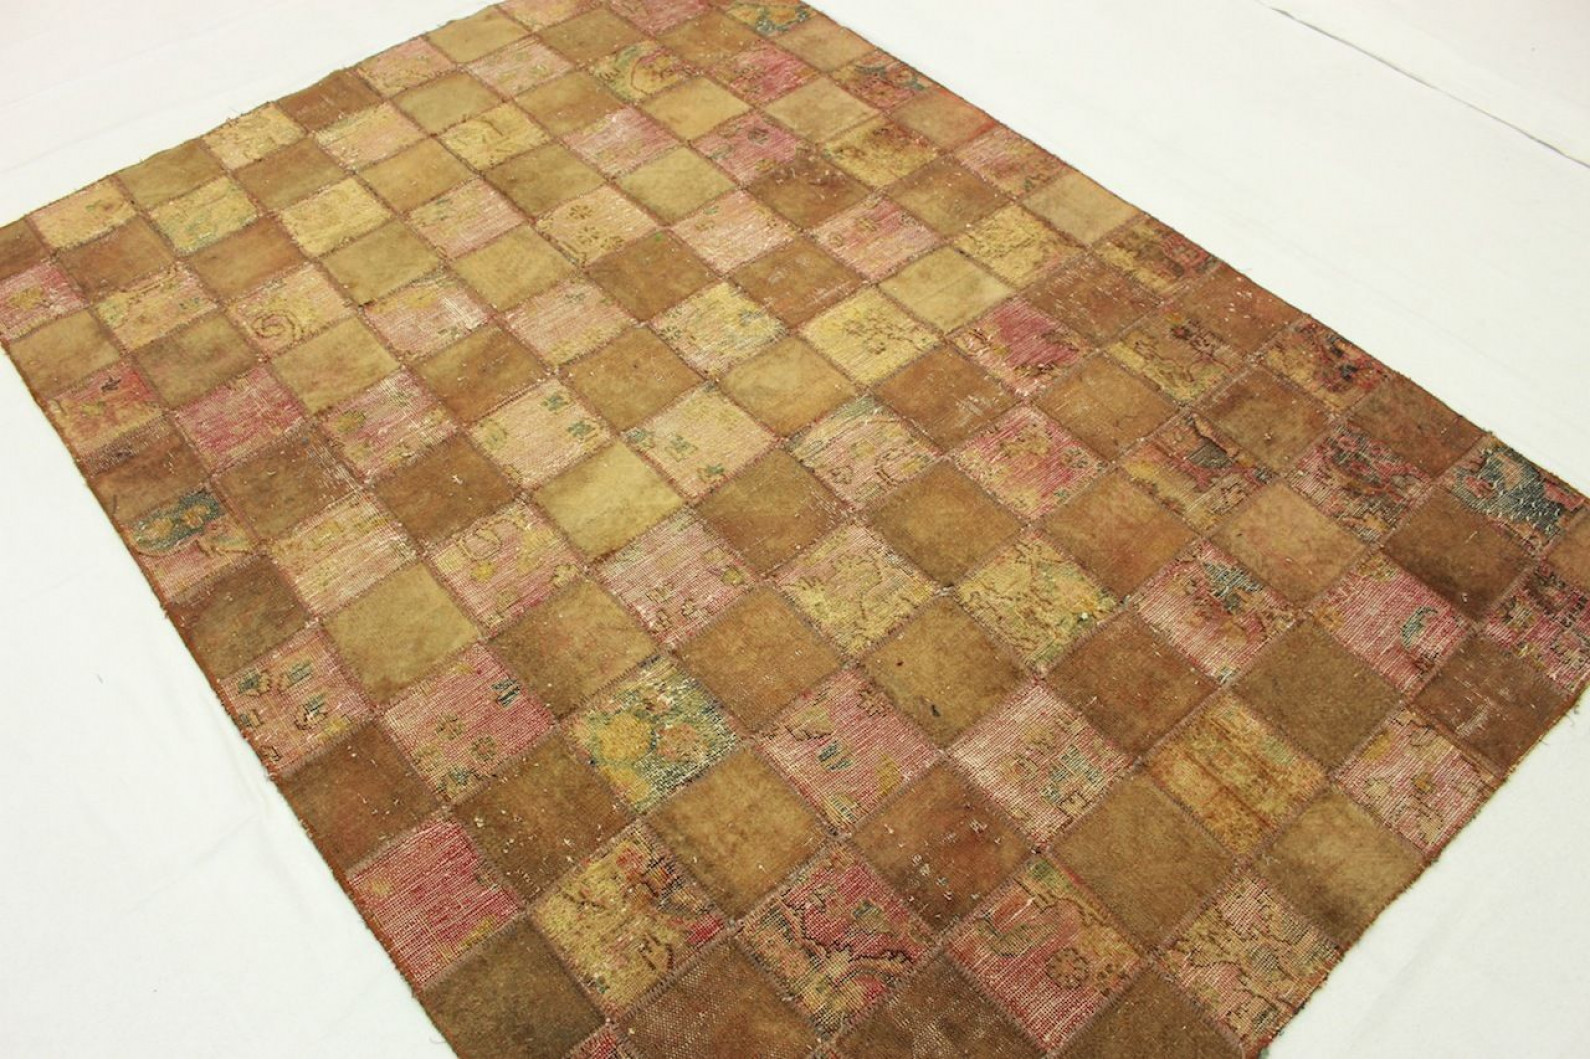 patchwork teppich braun rosa in 210x150cm 1001 2487 bei. Black Bedroom Furniture Sets. Home Design Ideas